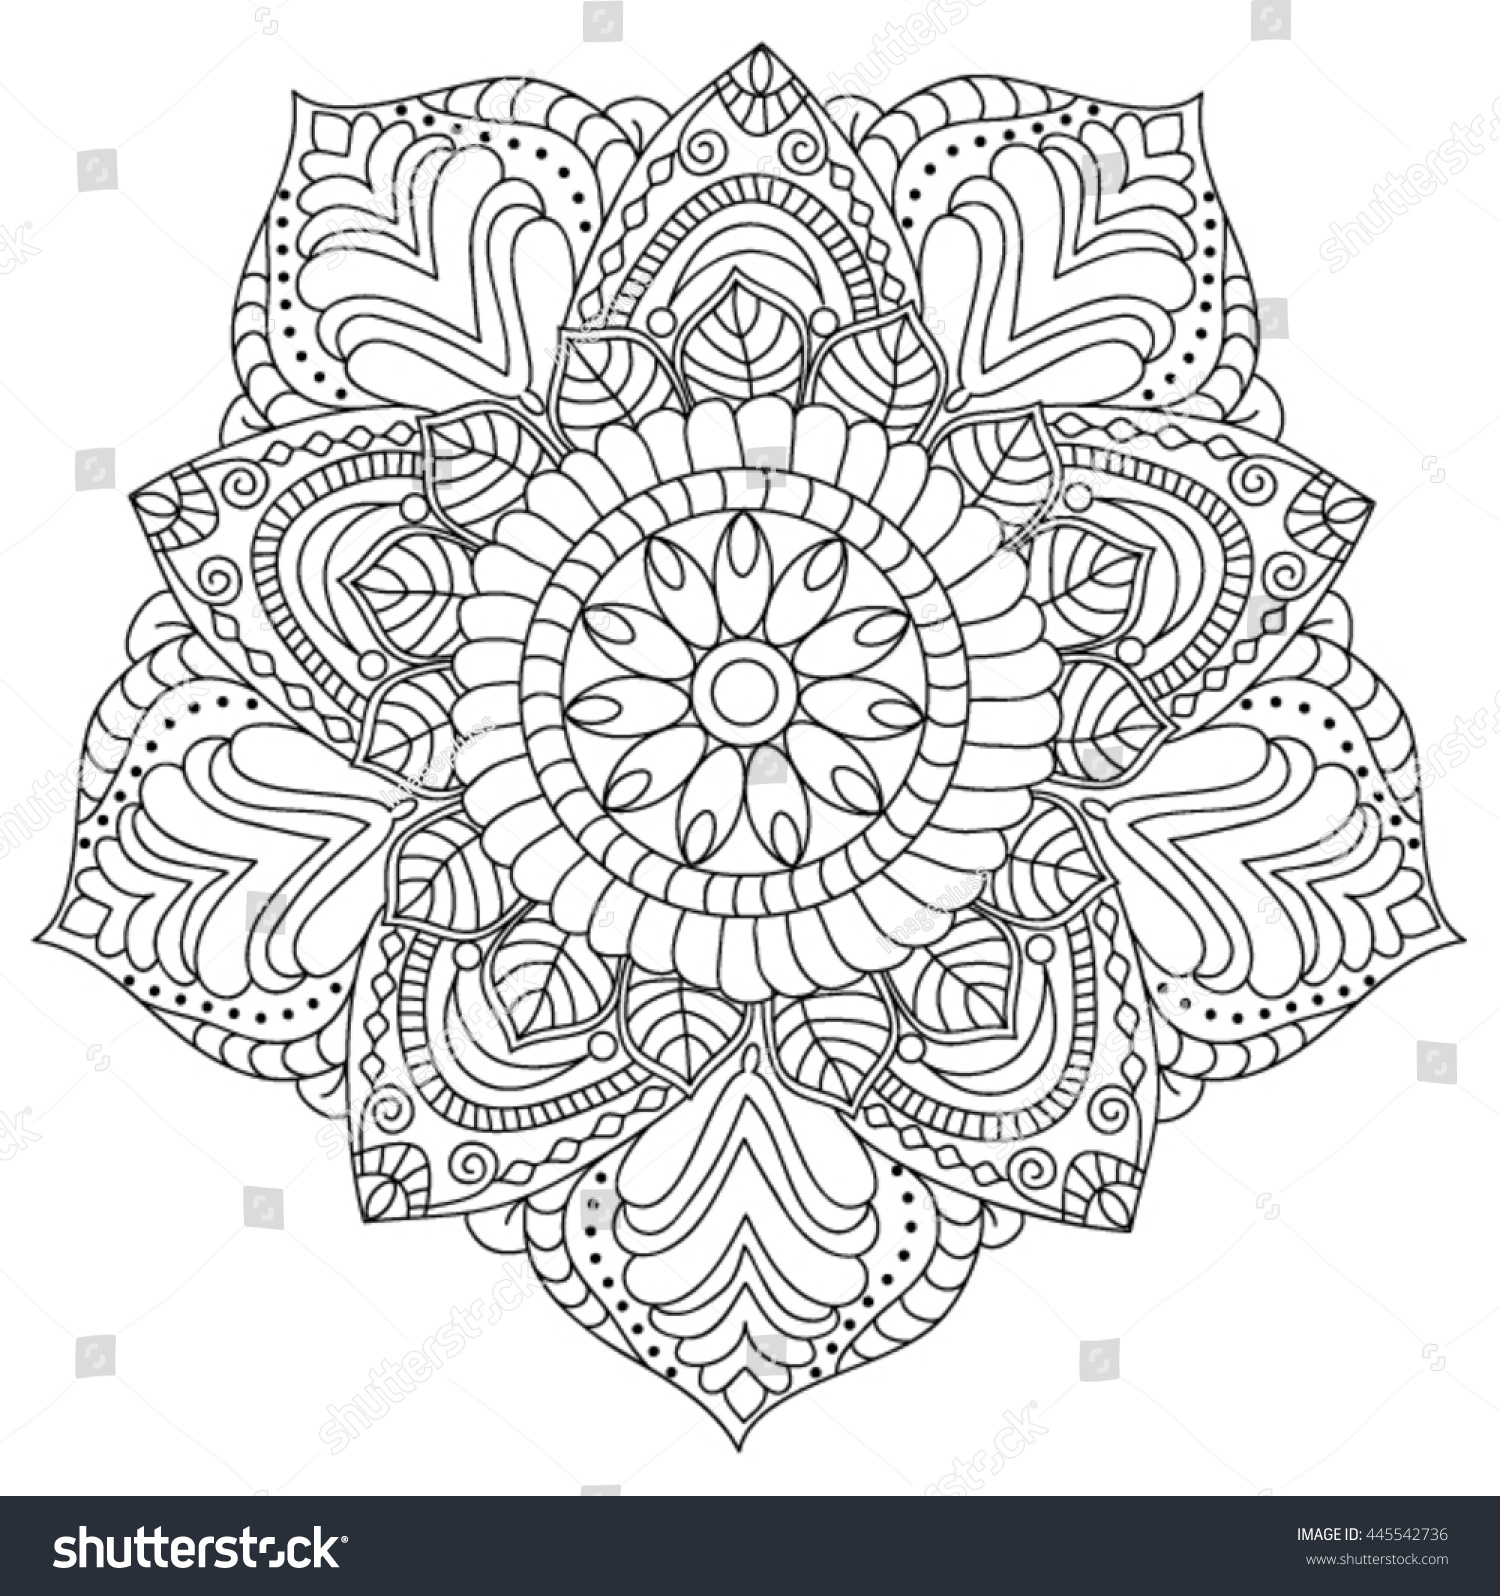 mandala coloring page illustration stock vector 445542736